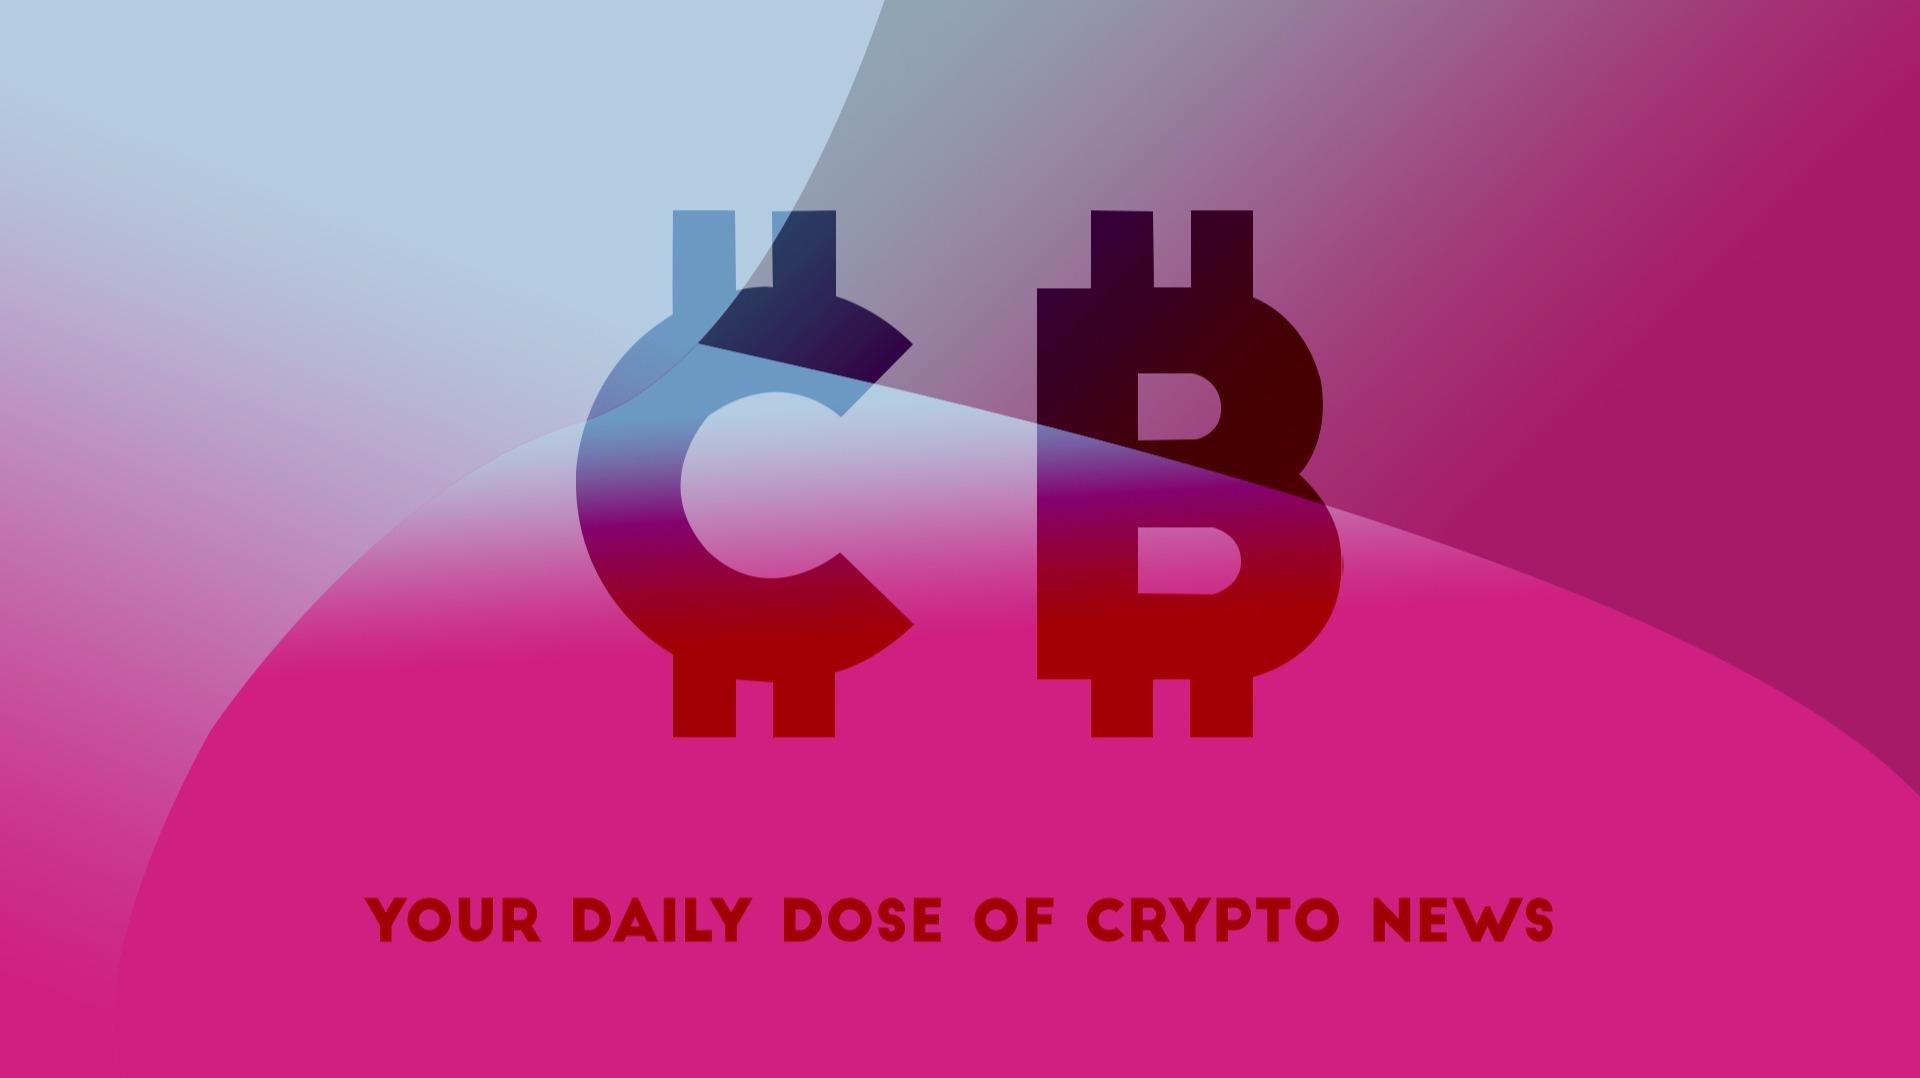 DailyCryptonews by cryptoborges - 27/01/2021